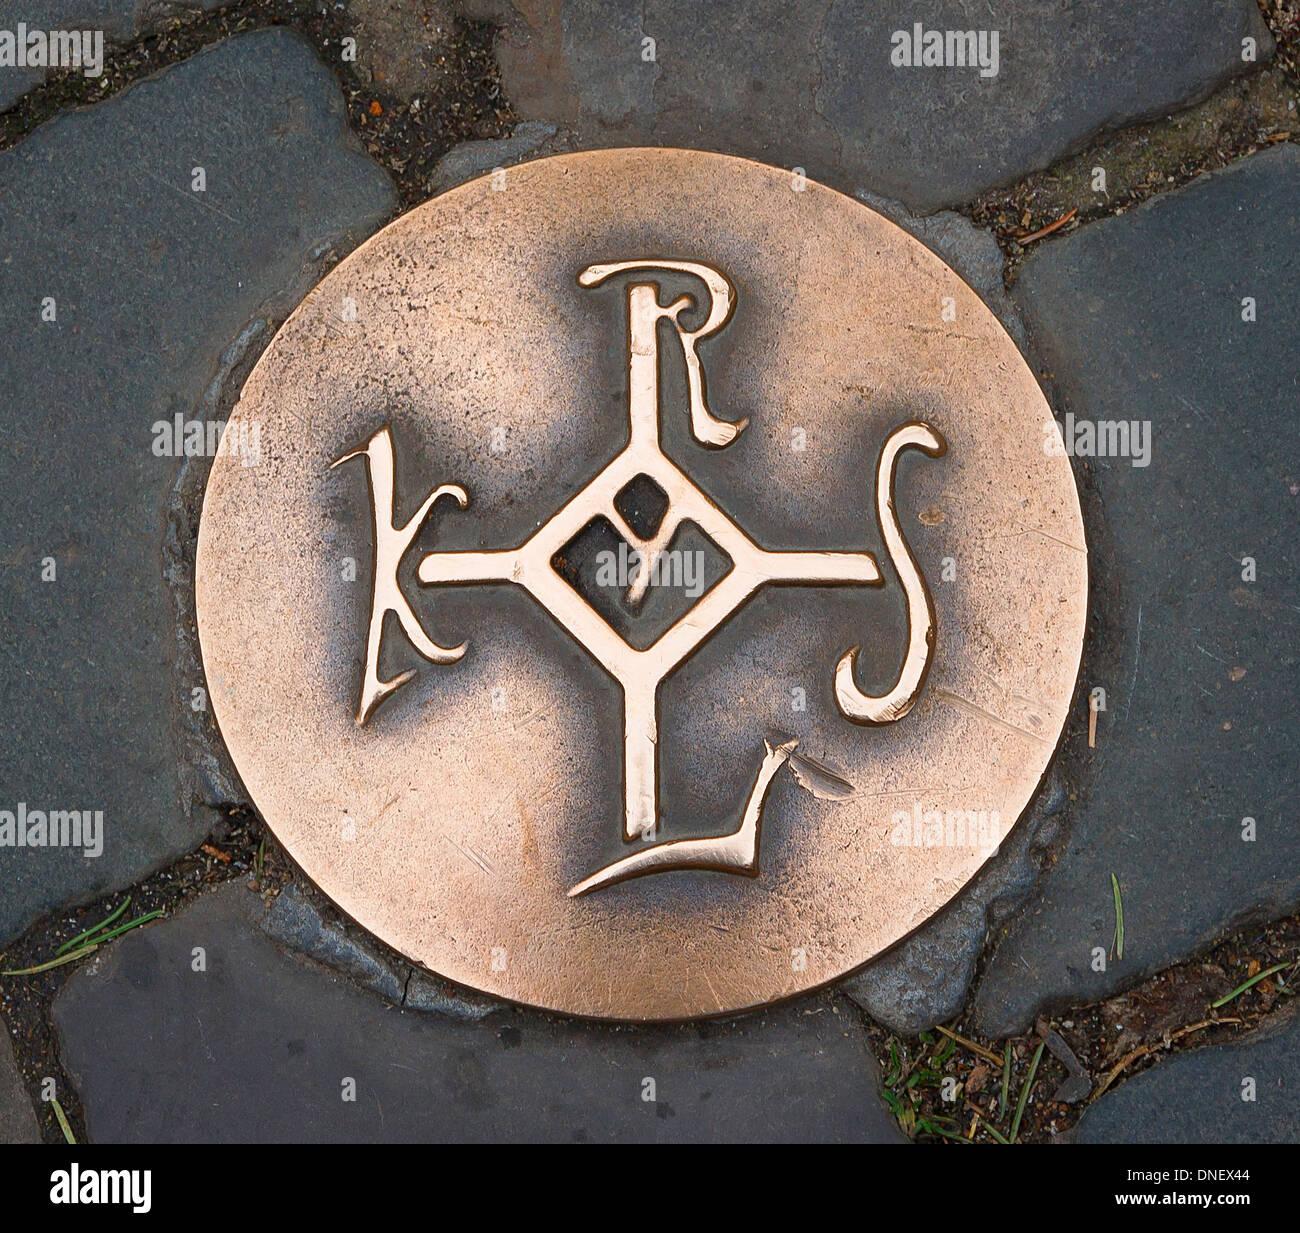 Monogram of Carolus Magnus, on the ground of the Münsterplatz, Aachen, Germany. - Stock Image